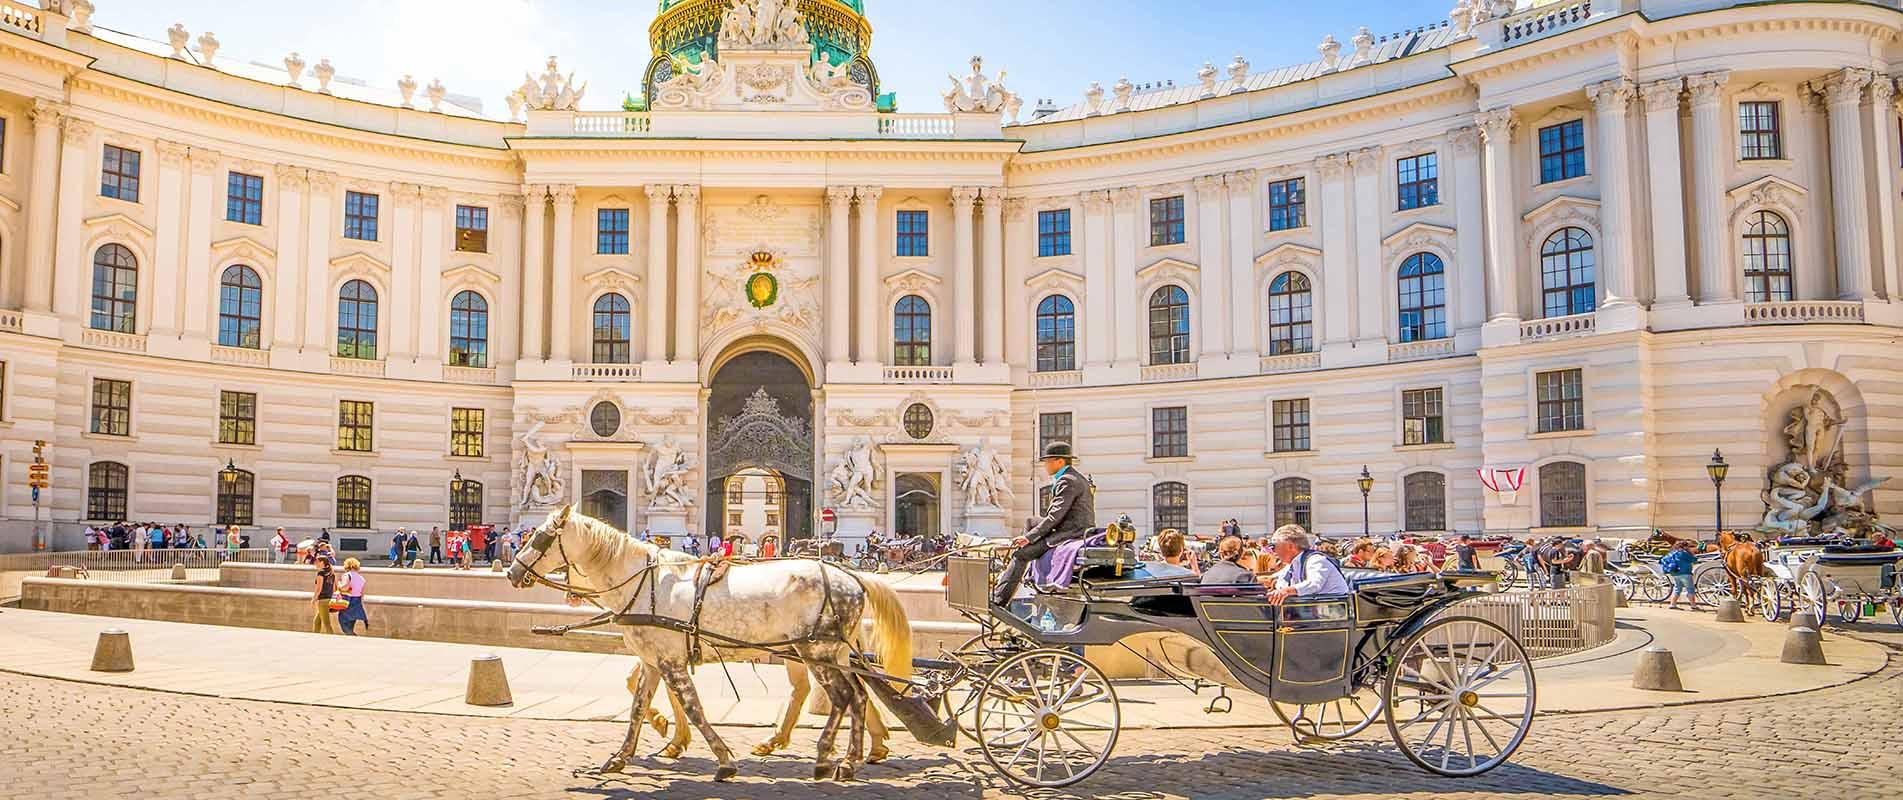 Austria - Vienna - Hofburg Palace 1 (main)